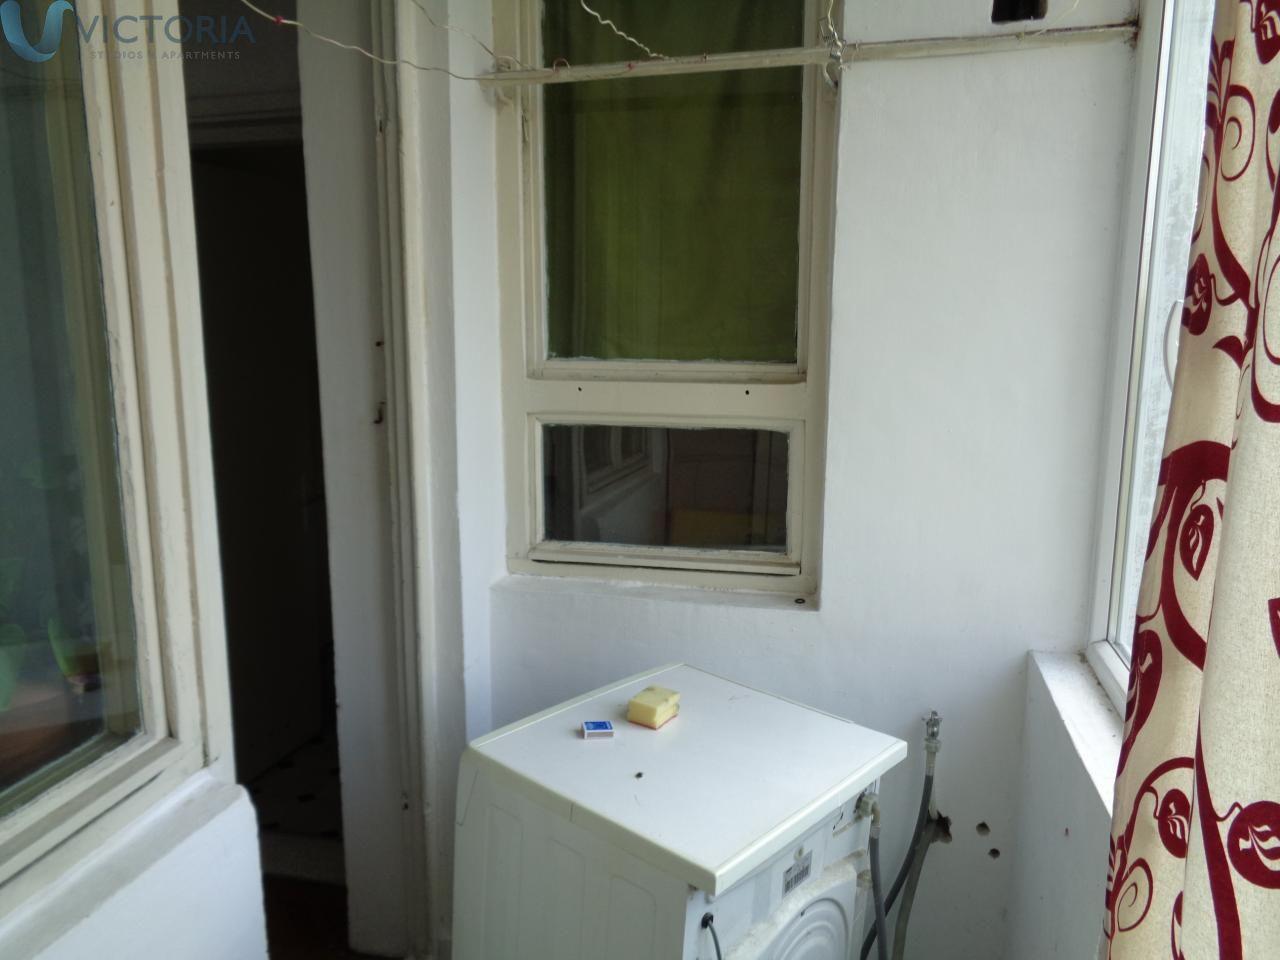 Apartament de vanzare, Argeș (judet), Craiovei - Foto 6